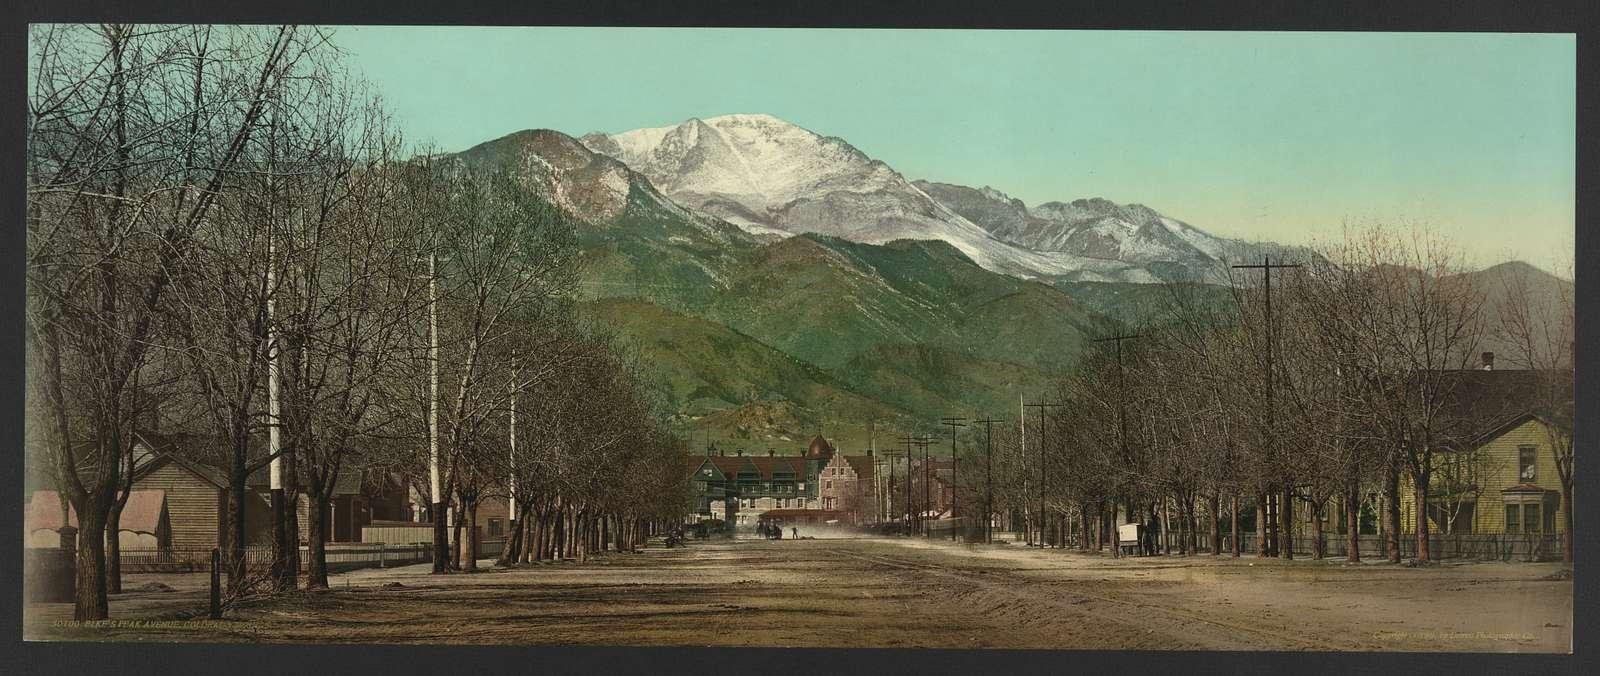 Pikes Peak Avenue, Colorado Springs